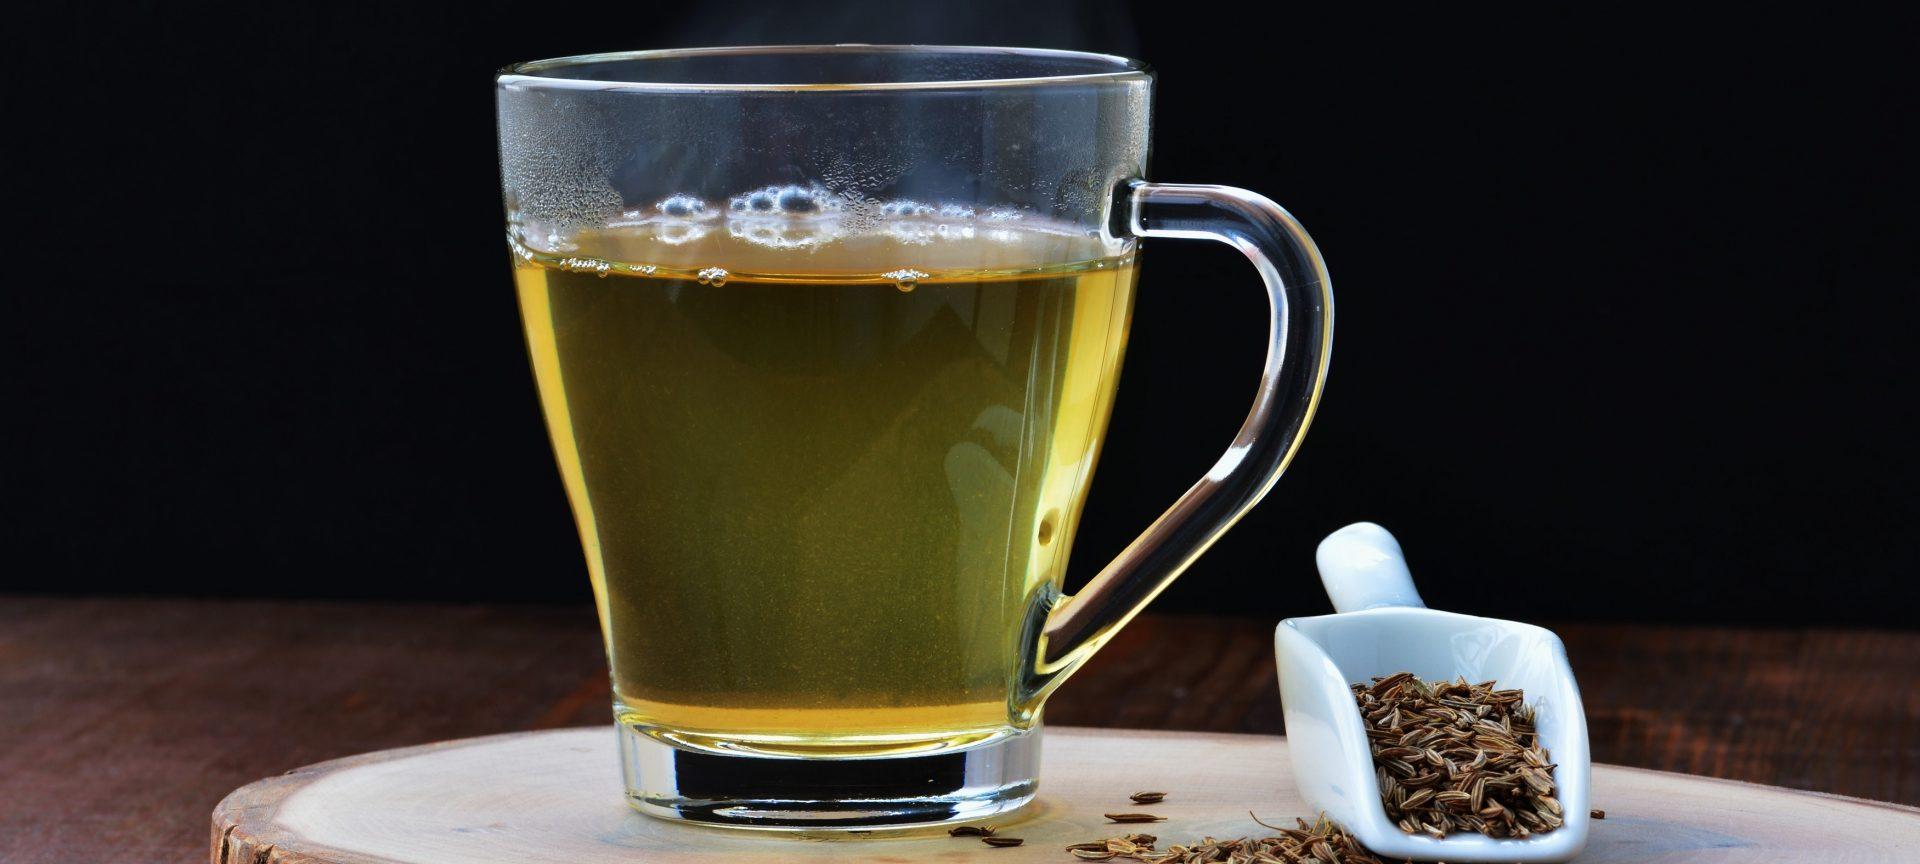 dieta cu ceai de chimen)